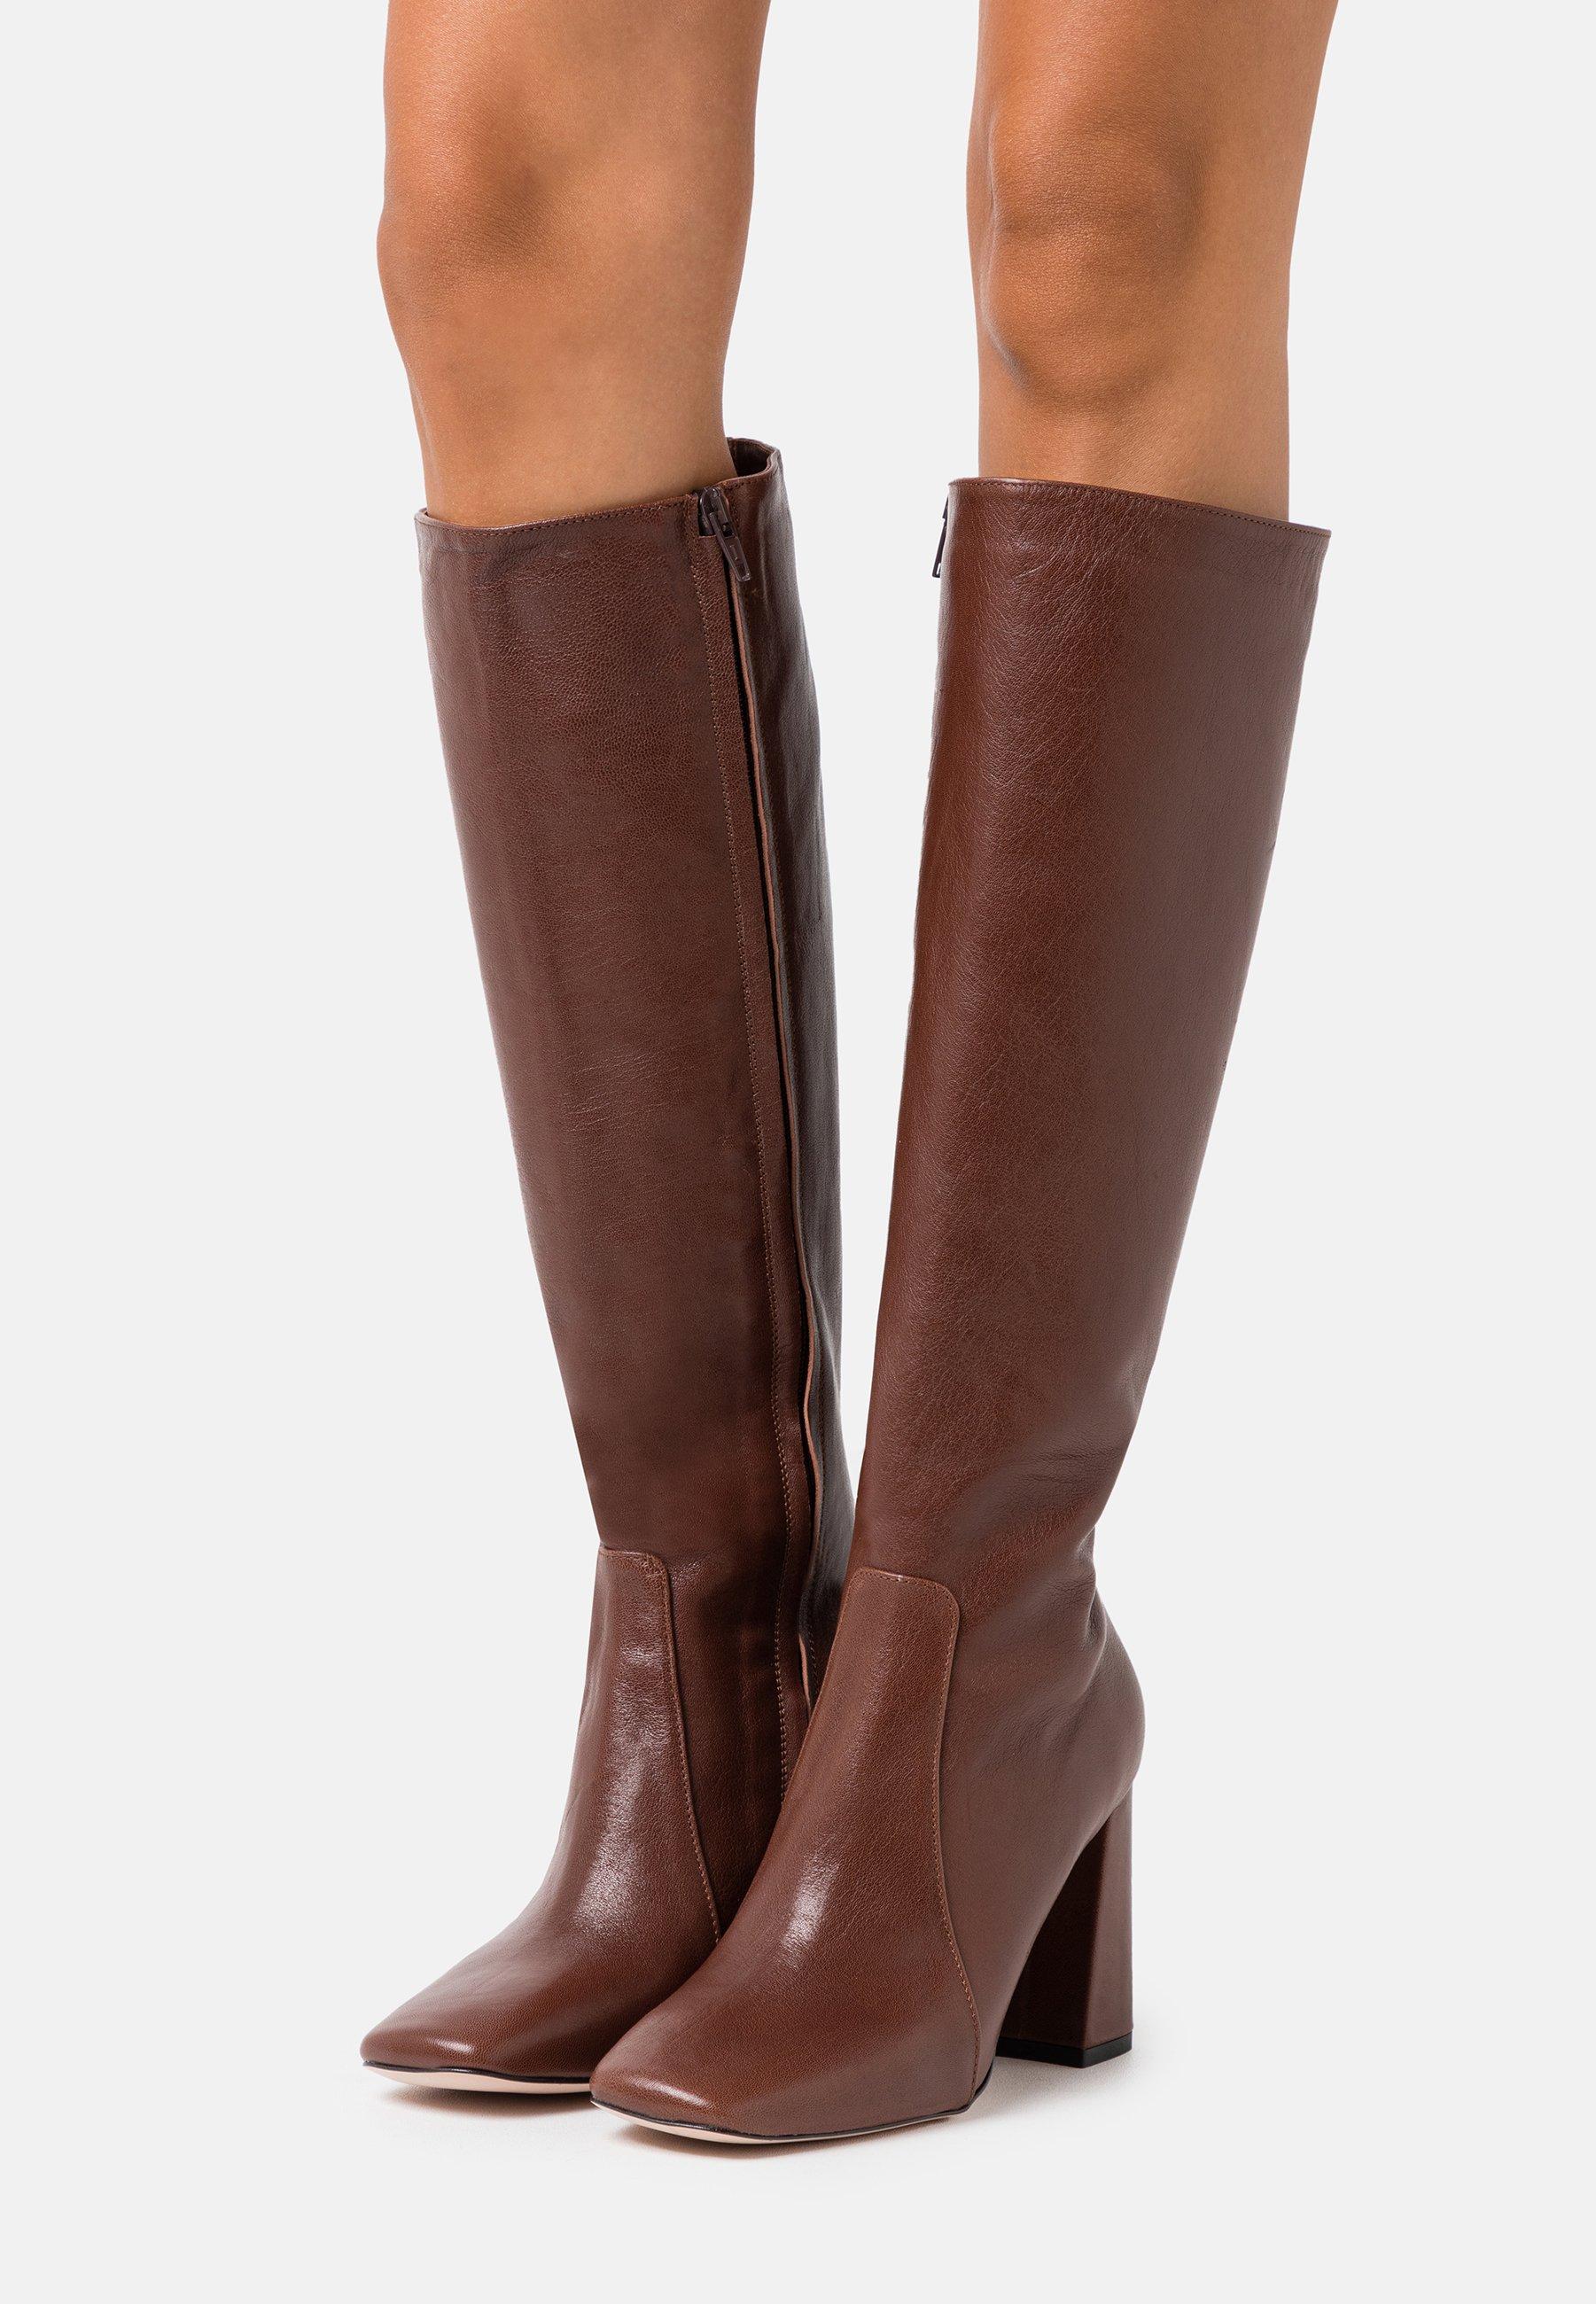 Bianca Di High heeled boots - choco Women's Boots FVMEh